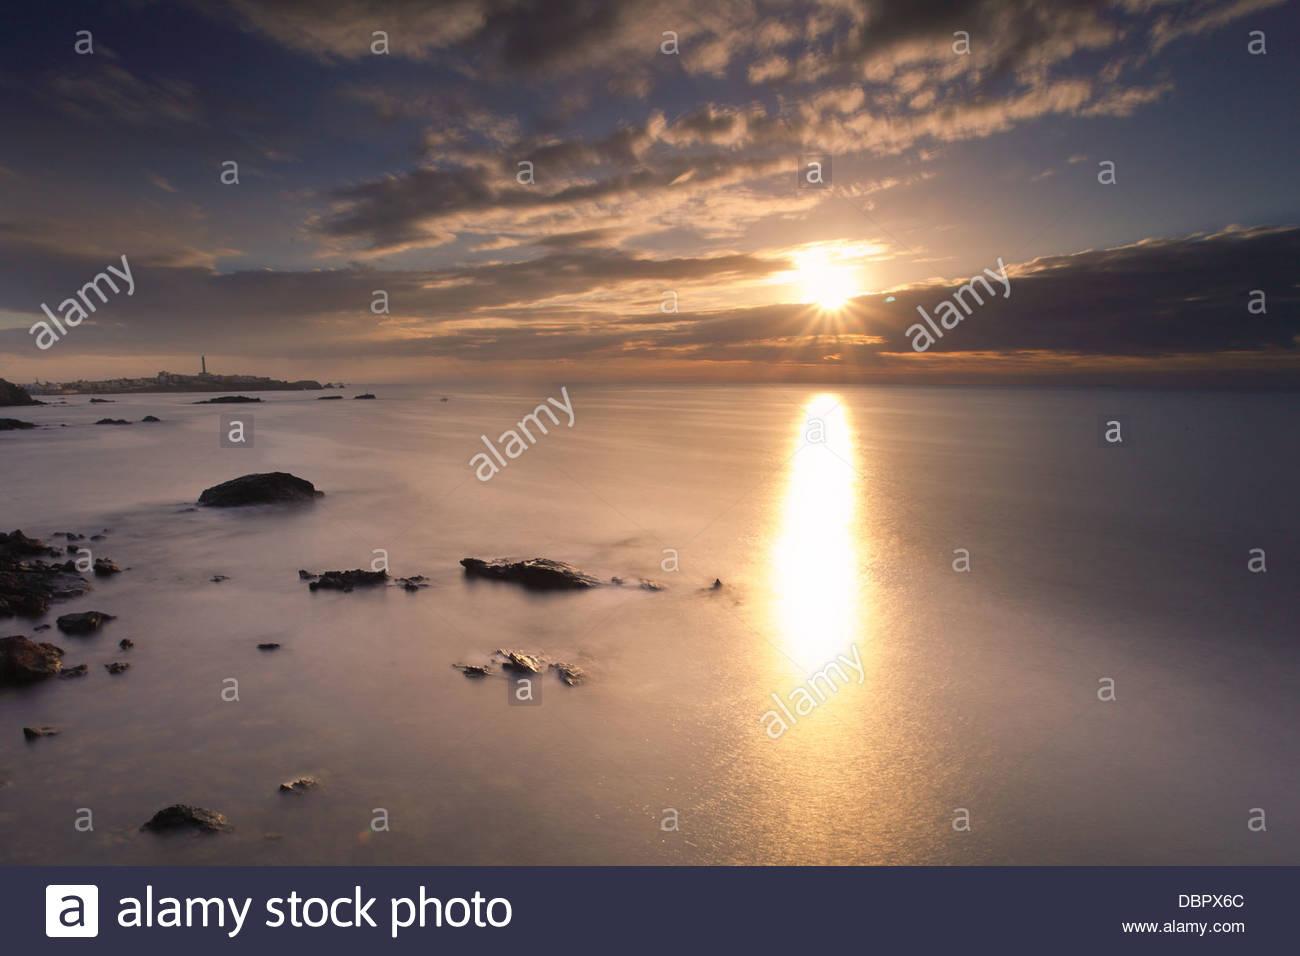 Rising sun at the ocean - Stock Image